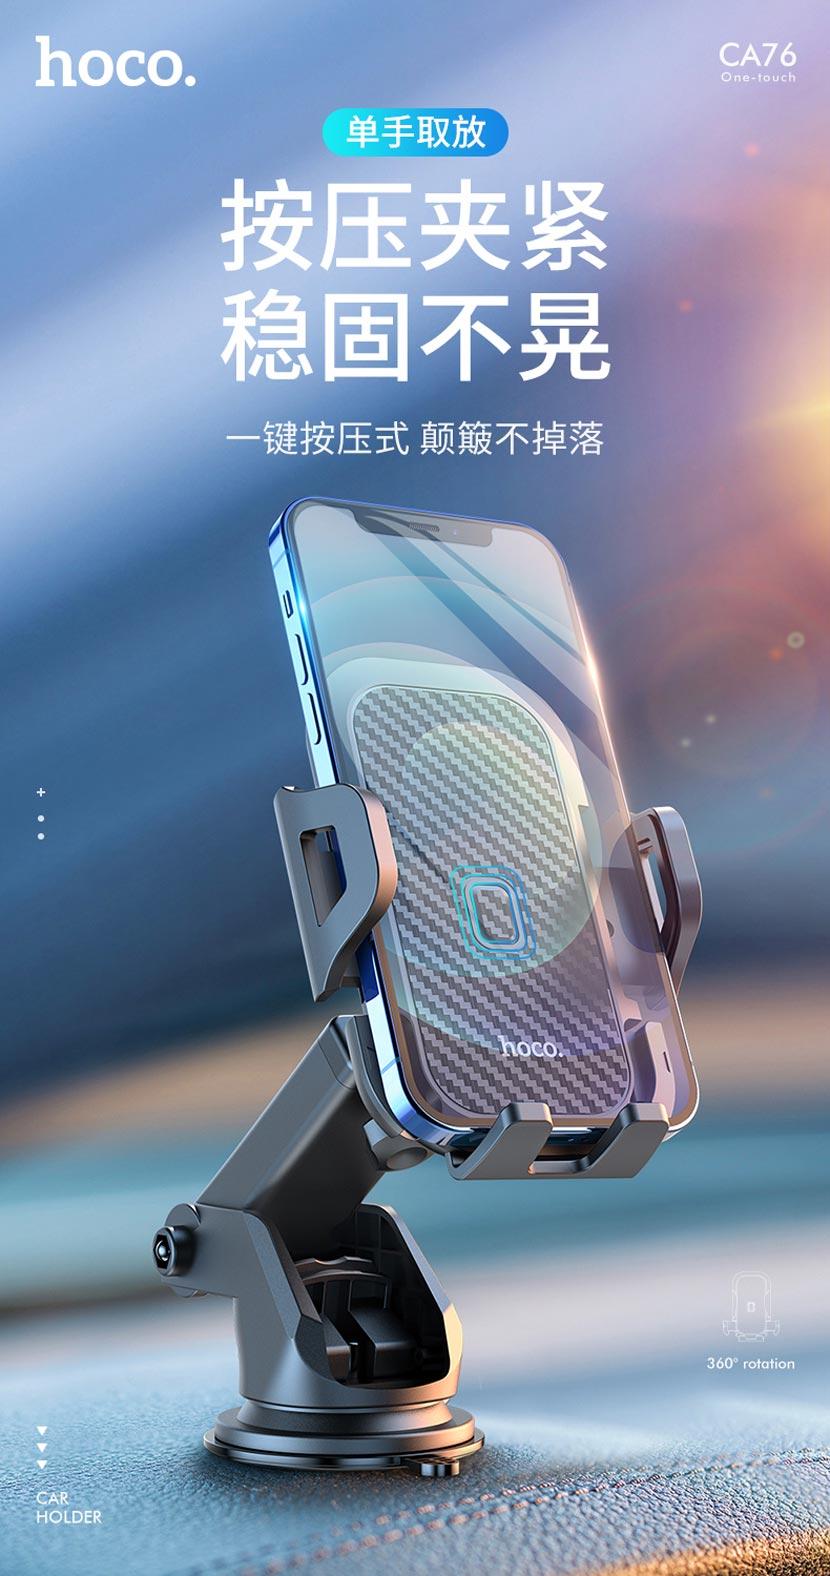 hoco news ca76 touareg one touch center console car holder cn